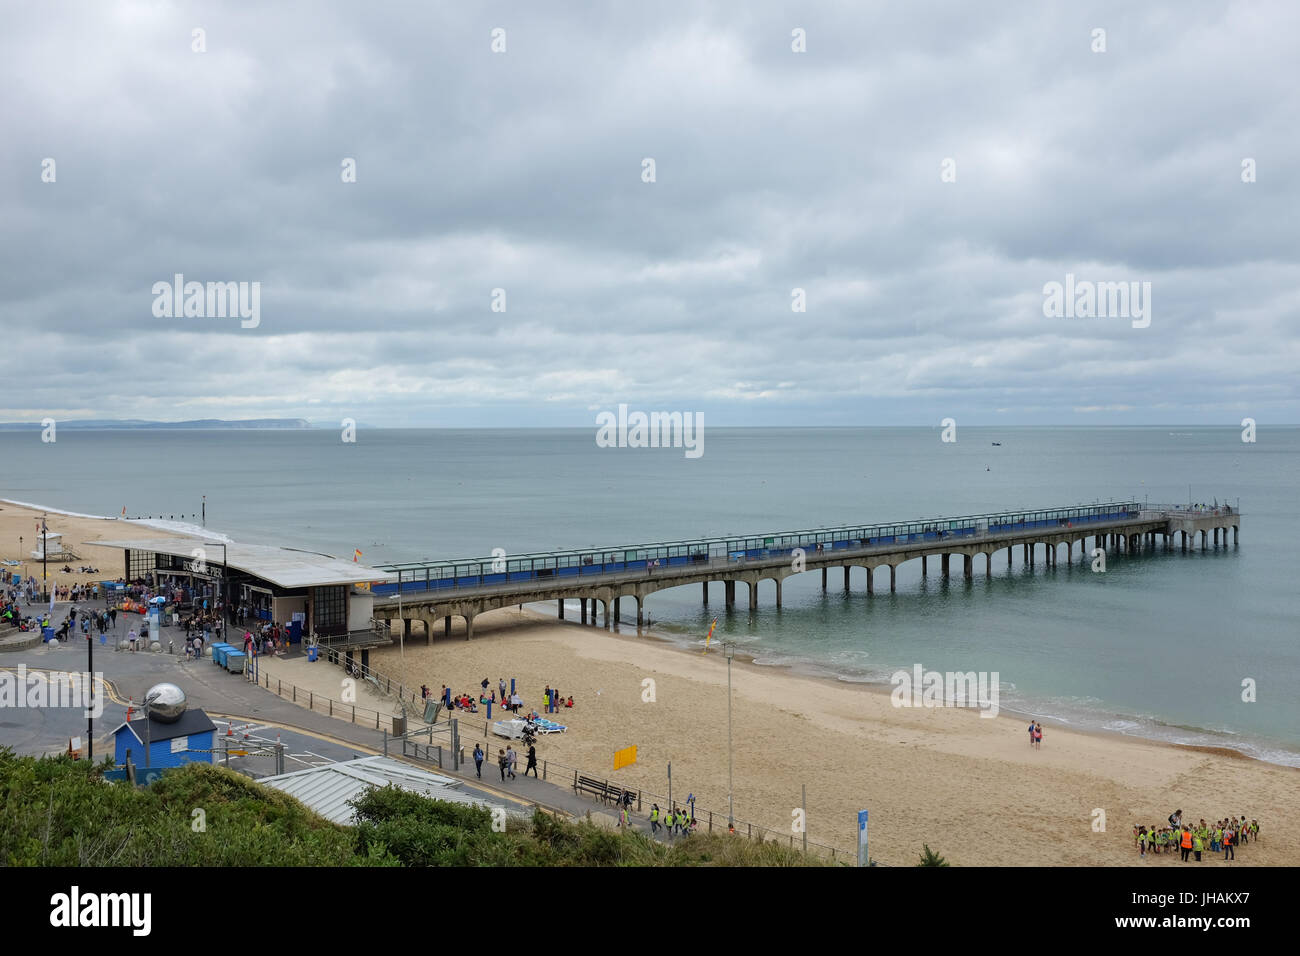 Boscombe pier near Bournemouth, Dorset, England. - Stock Image